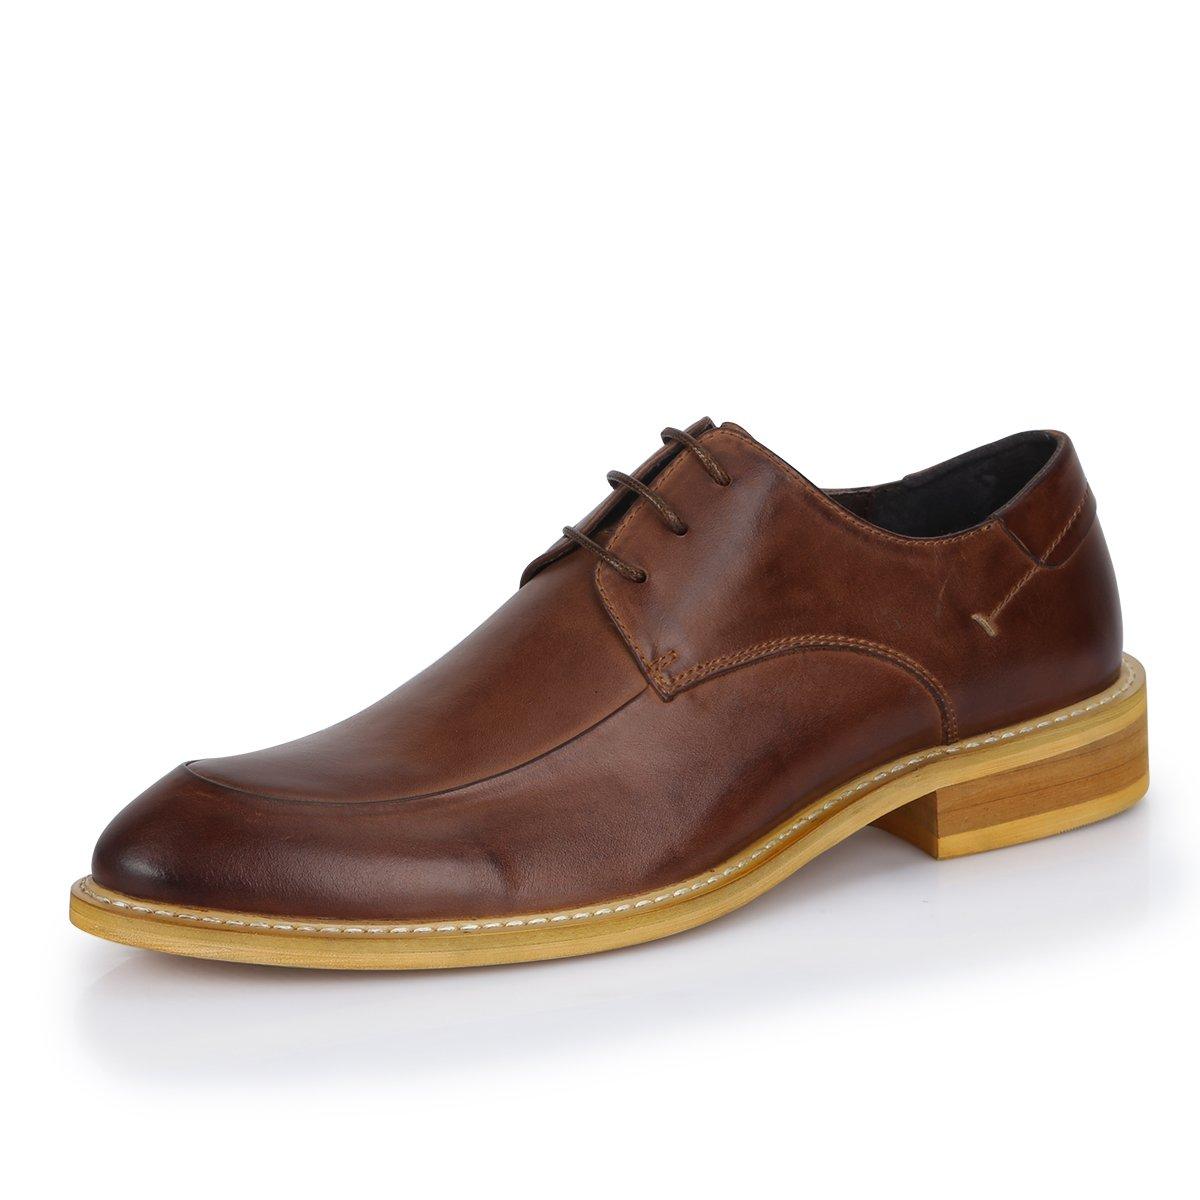 Gaofu yinxiang Herren 's British Stil Casual Spitze bis Leder Schuhe